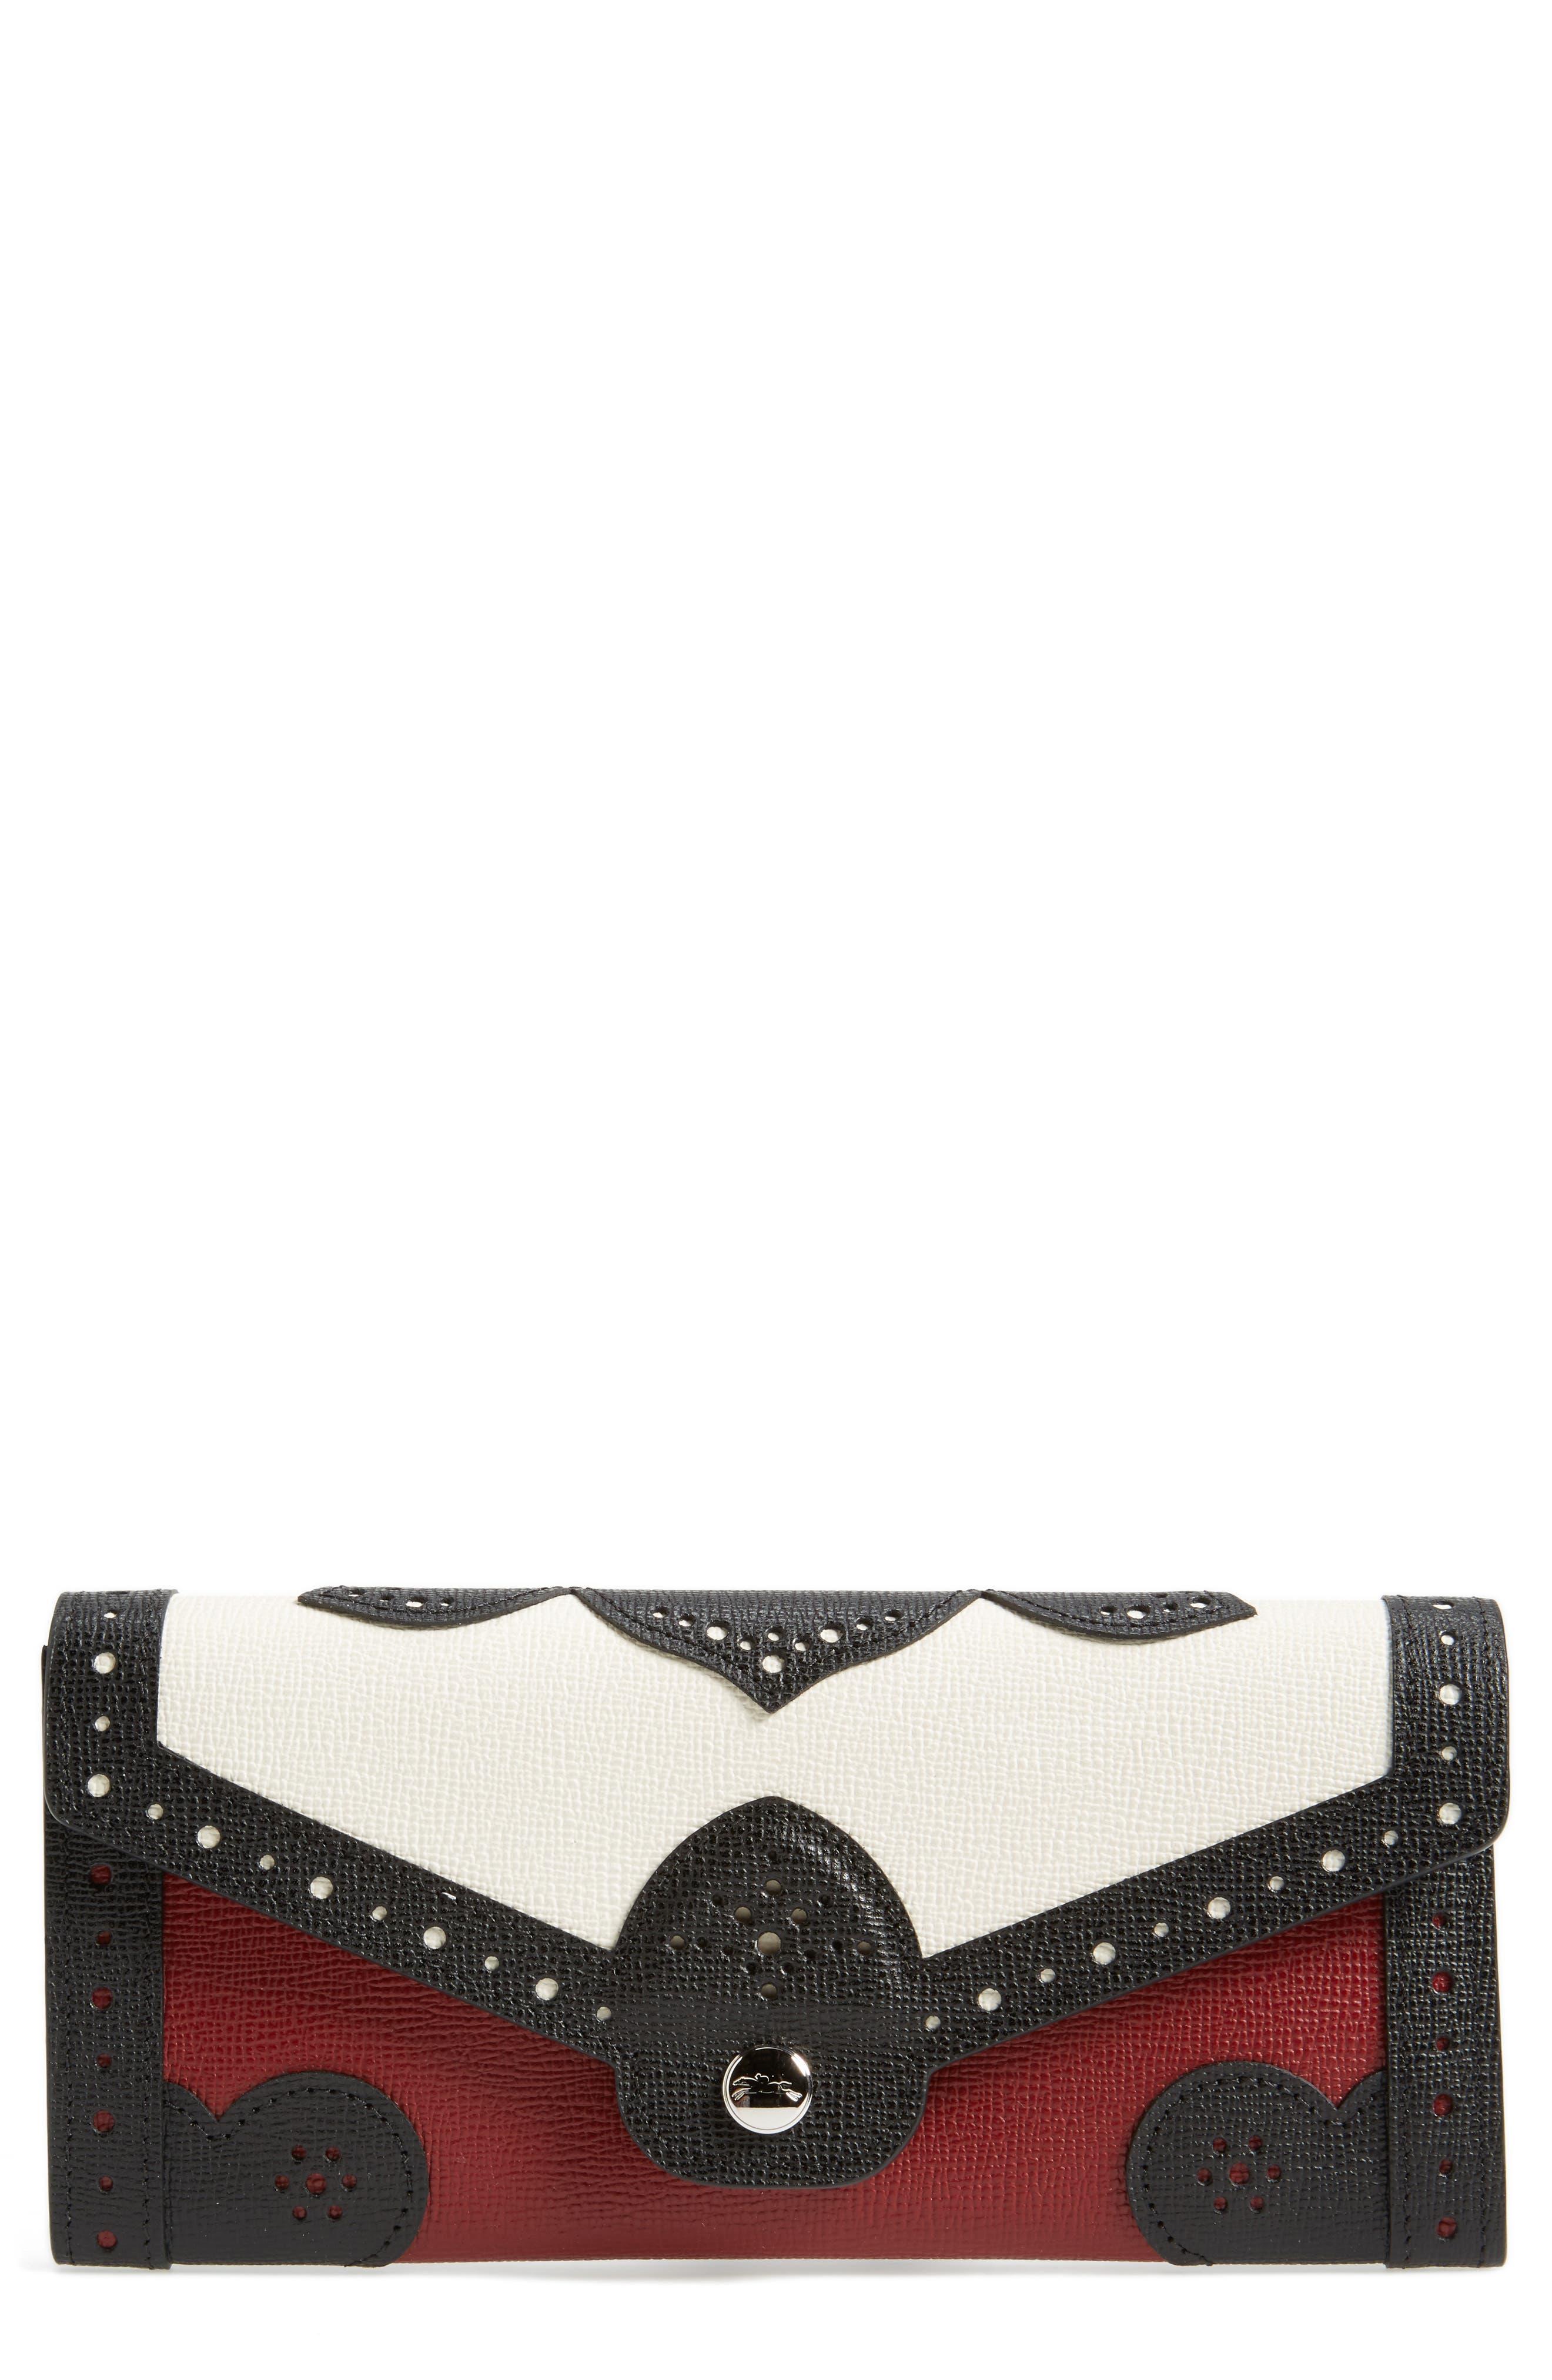 Alternate Image 1 Selected - Longchamp Effrontée Leather Wallet